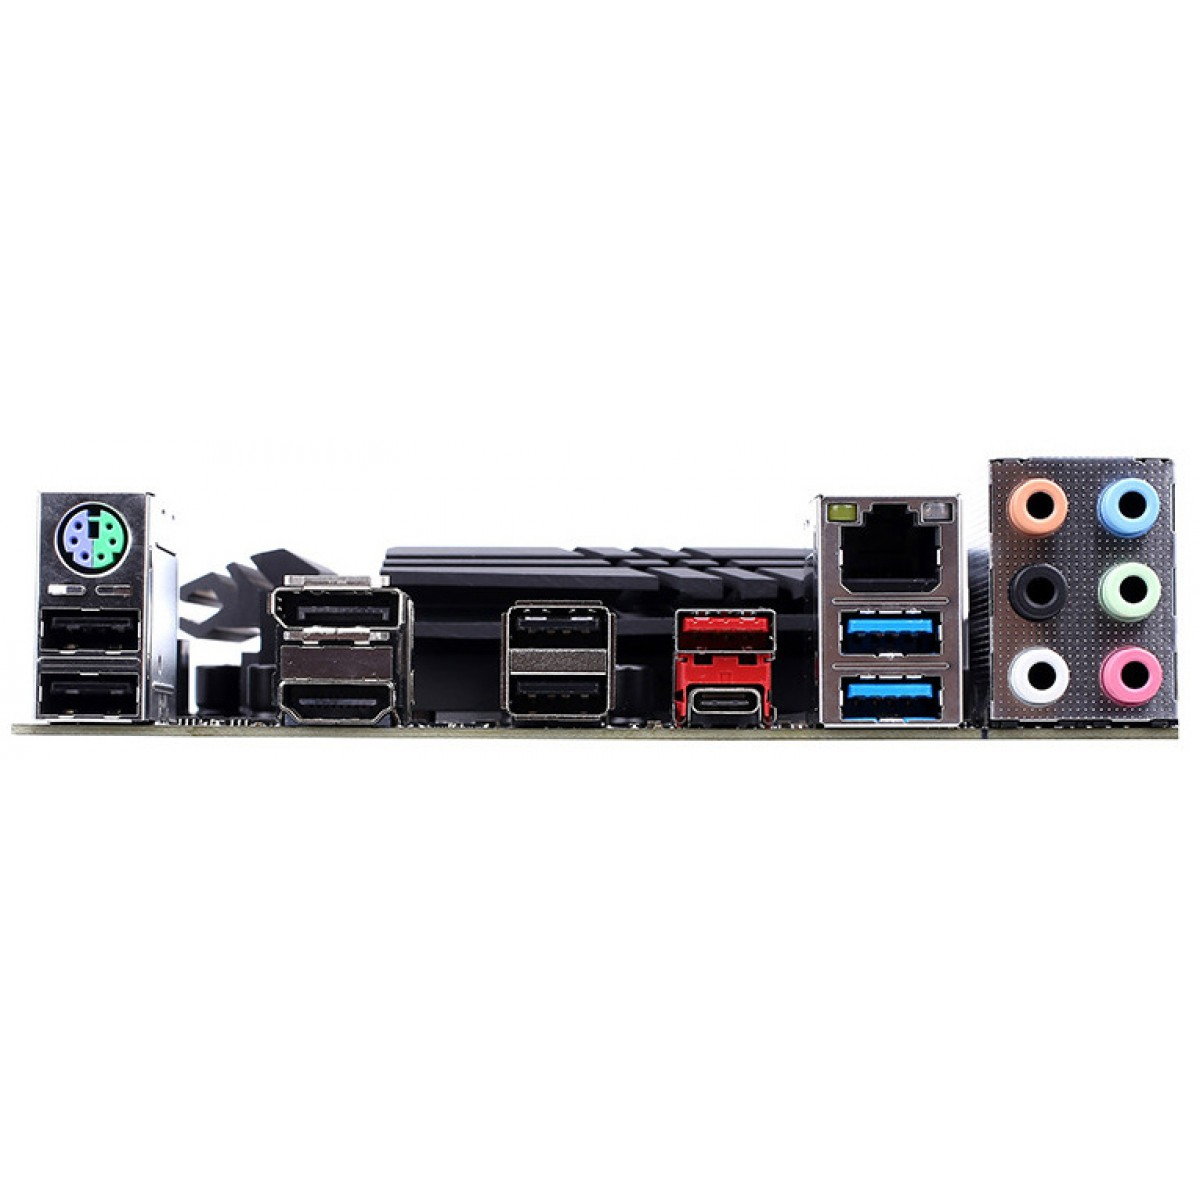 Placa Mãe Colorful BATTLE-AX Z490AK GAMING V20, Chipset Z490, Intel LGA 1200, AXT, DDR4, 110001206702